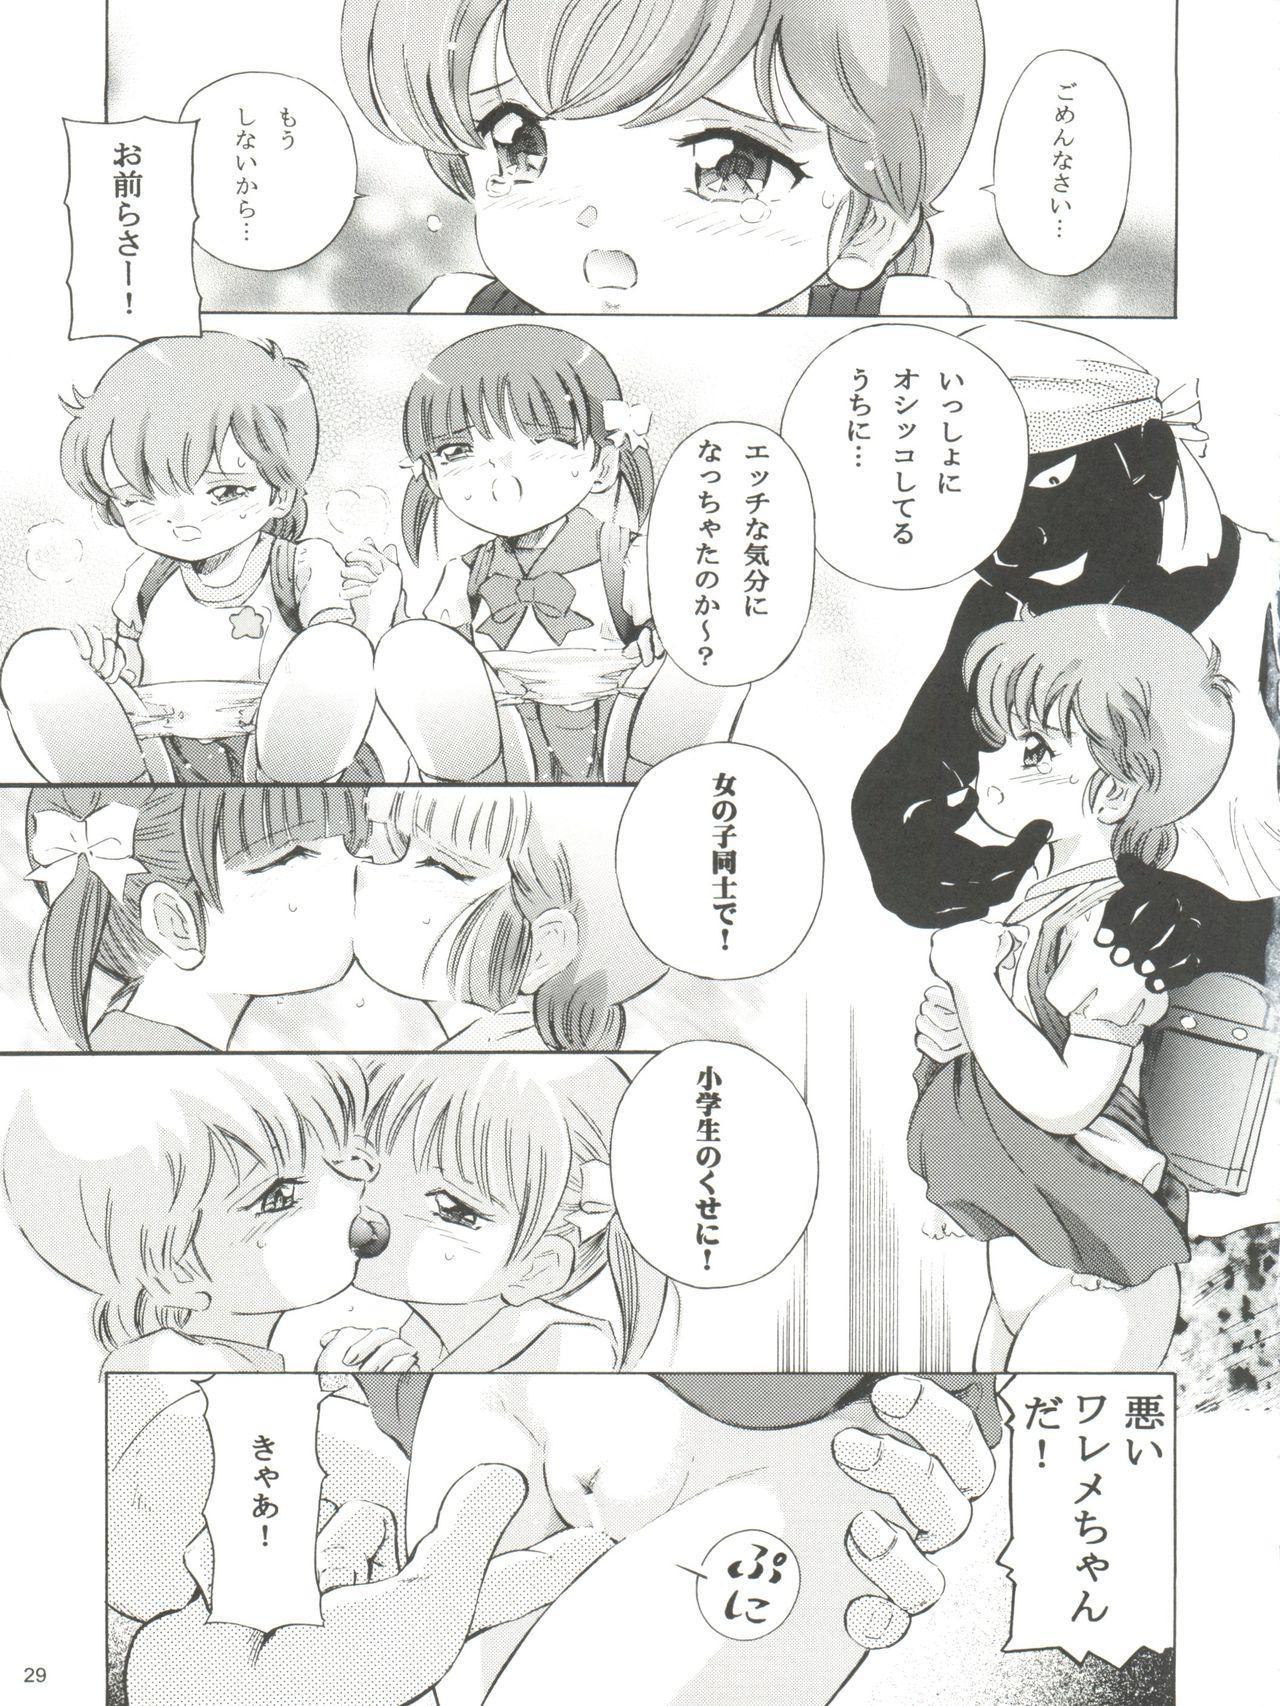 Mahou Kyuushiki 15 28